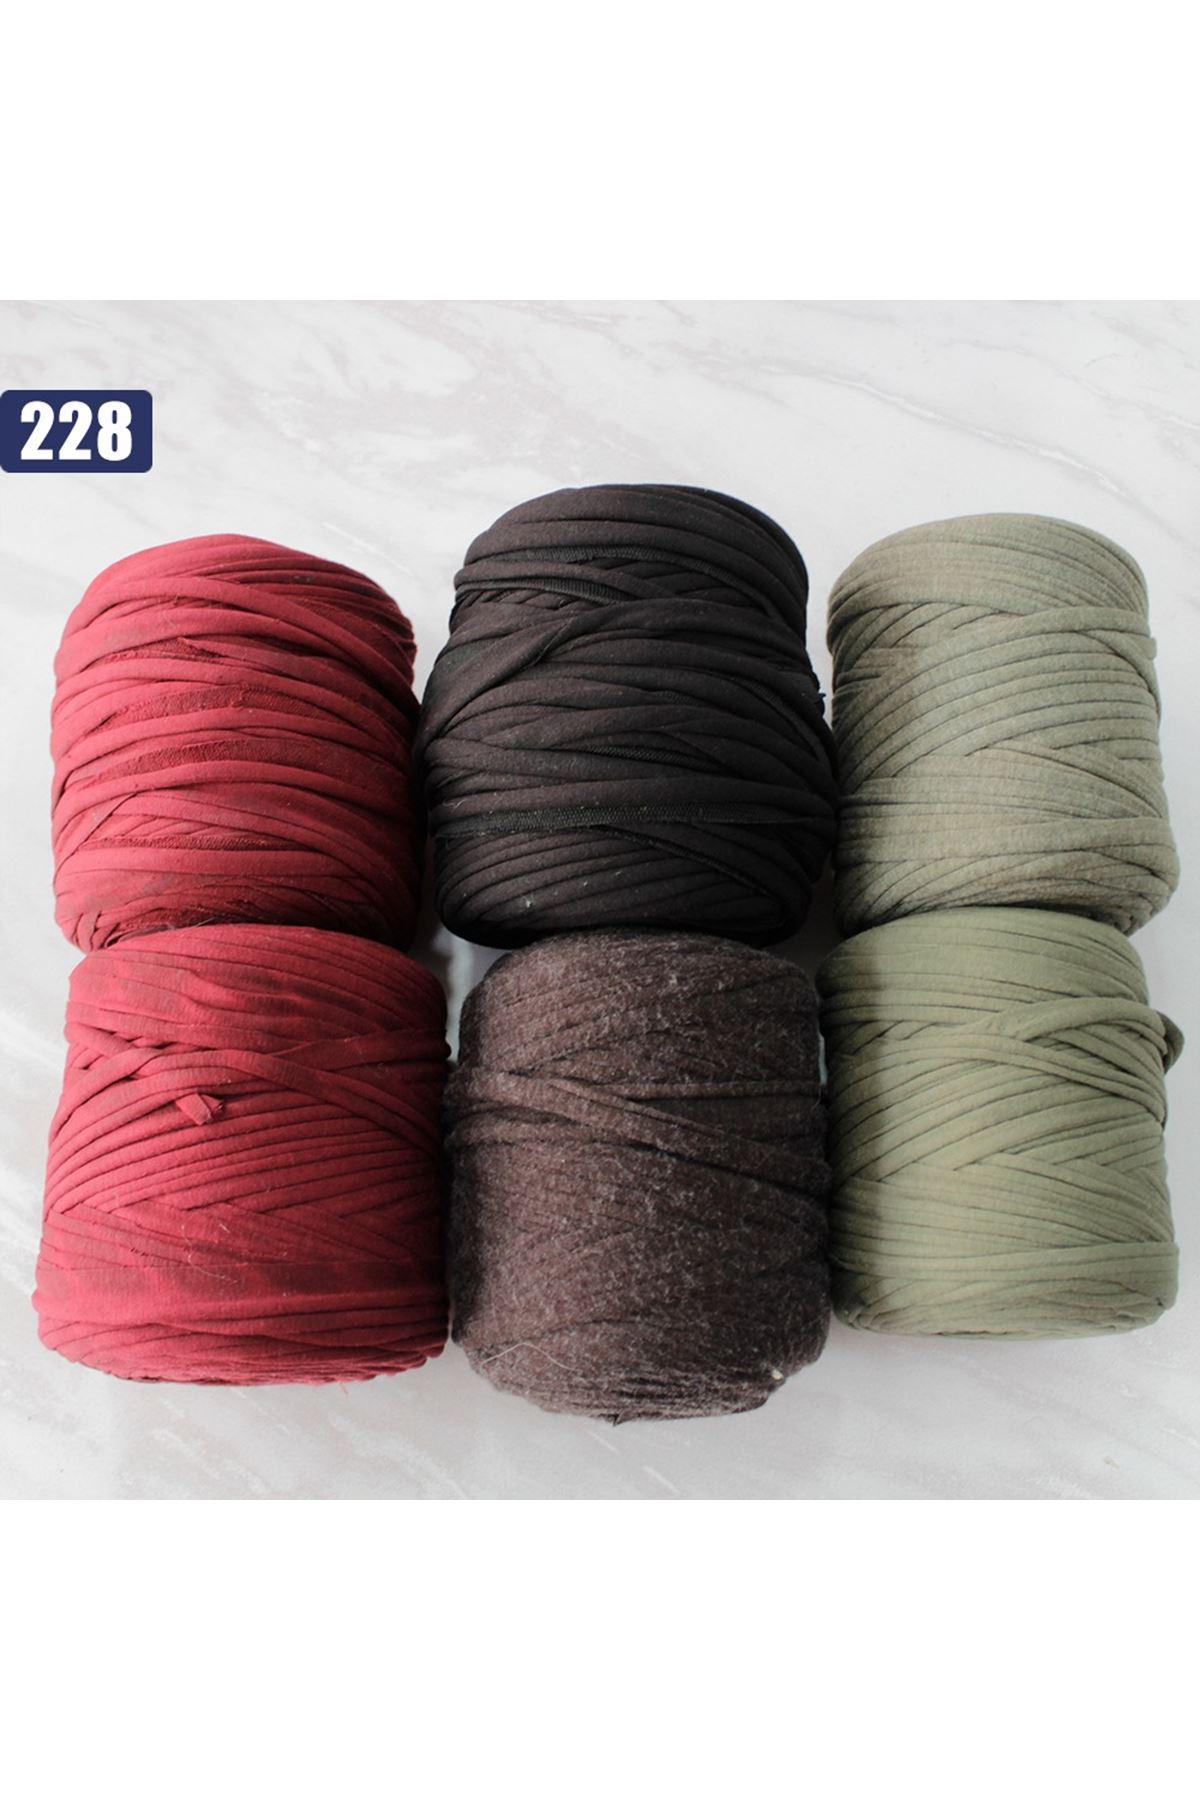 Penye 6'lı Grup 228